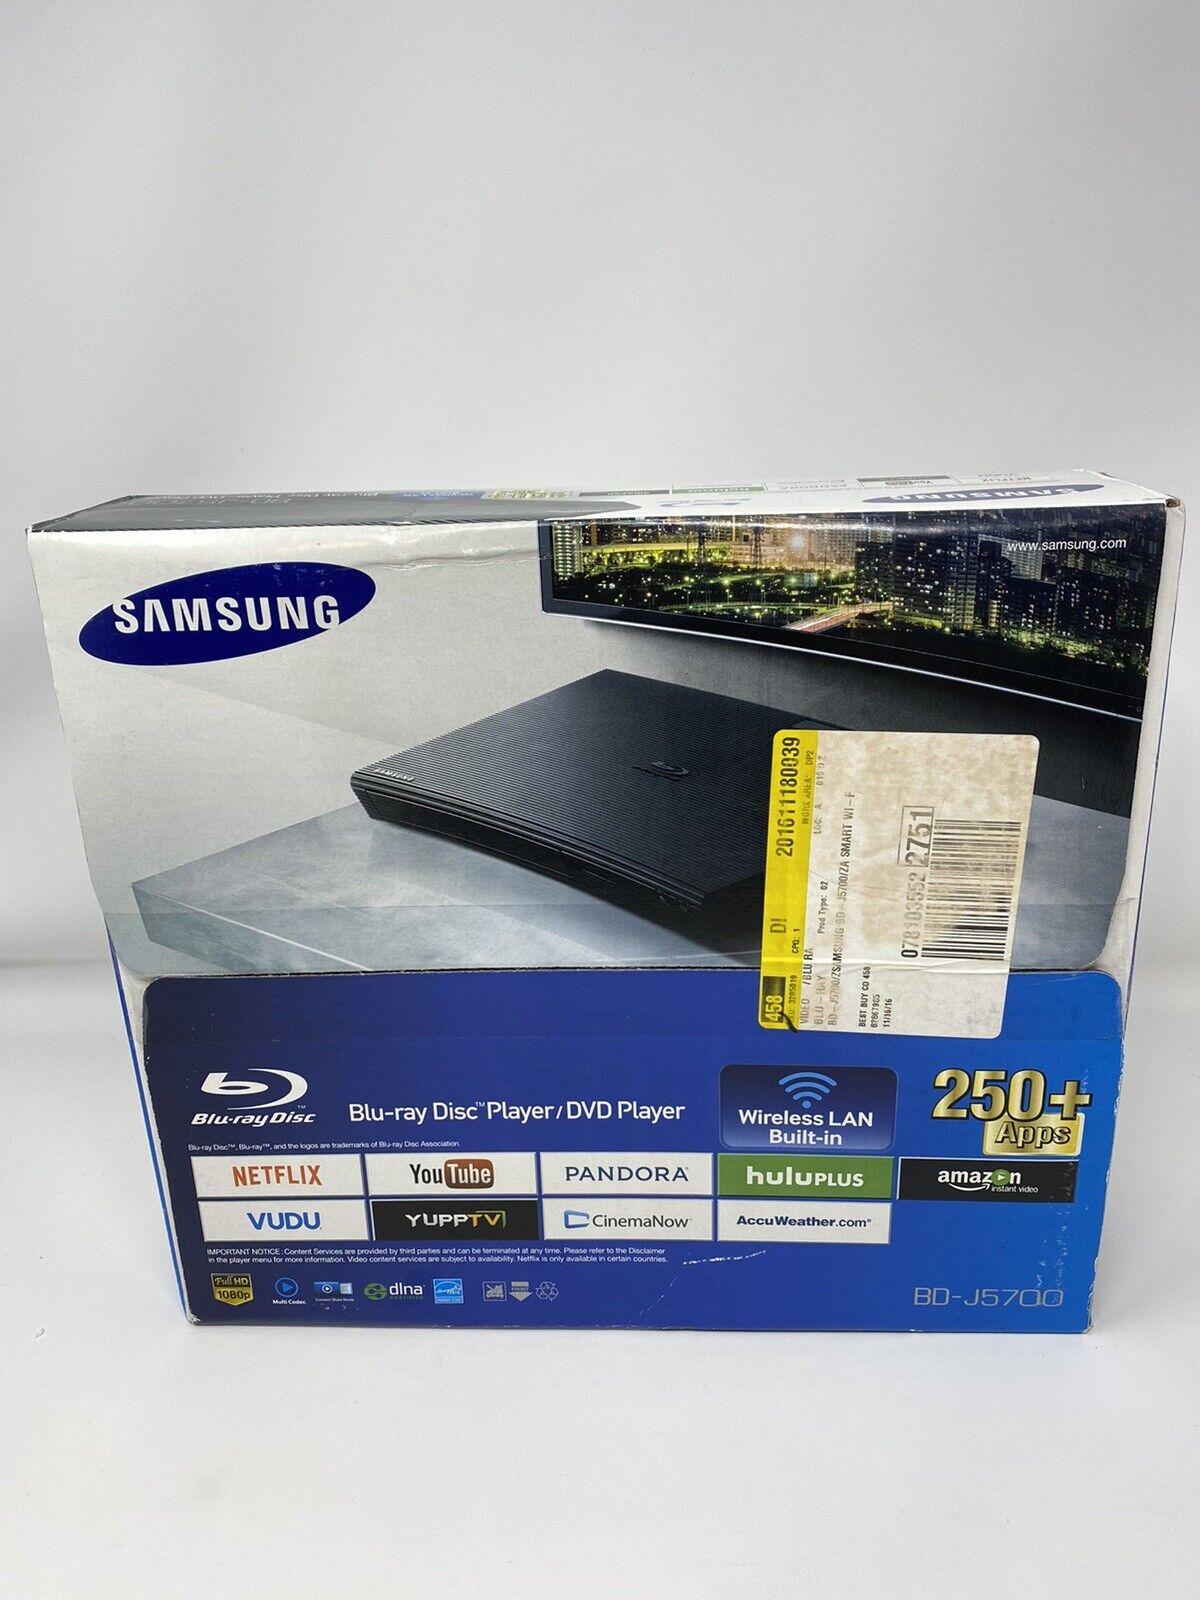 Samsung BD-J5700 Wi-Fi Blu Ray Player Brand New Sealed w/ Remote Streaming Apps apps blu brand new player ray remote samsung sealed streaming